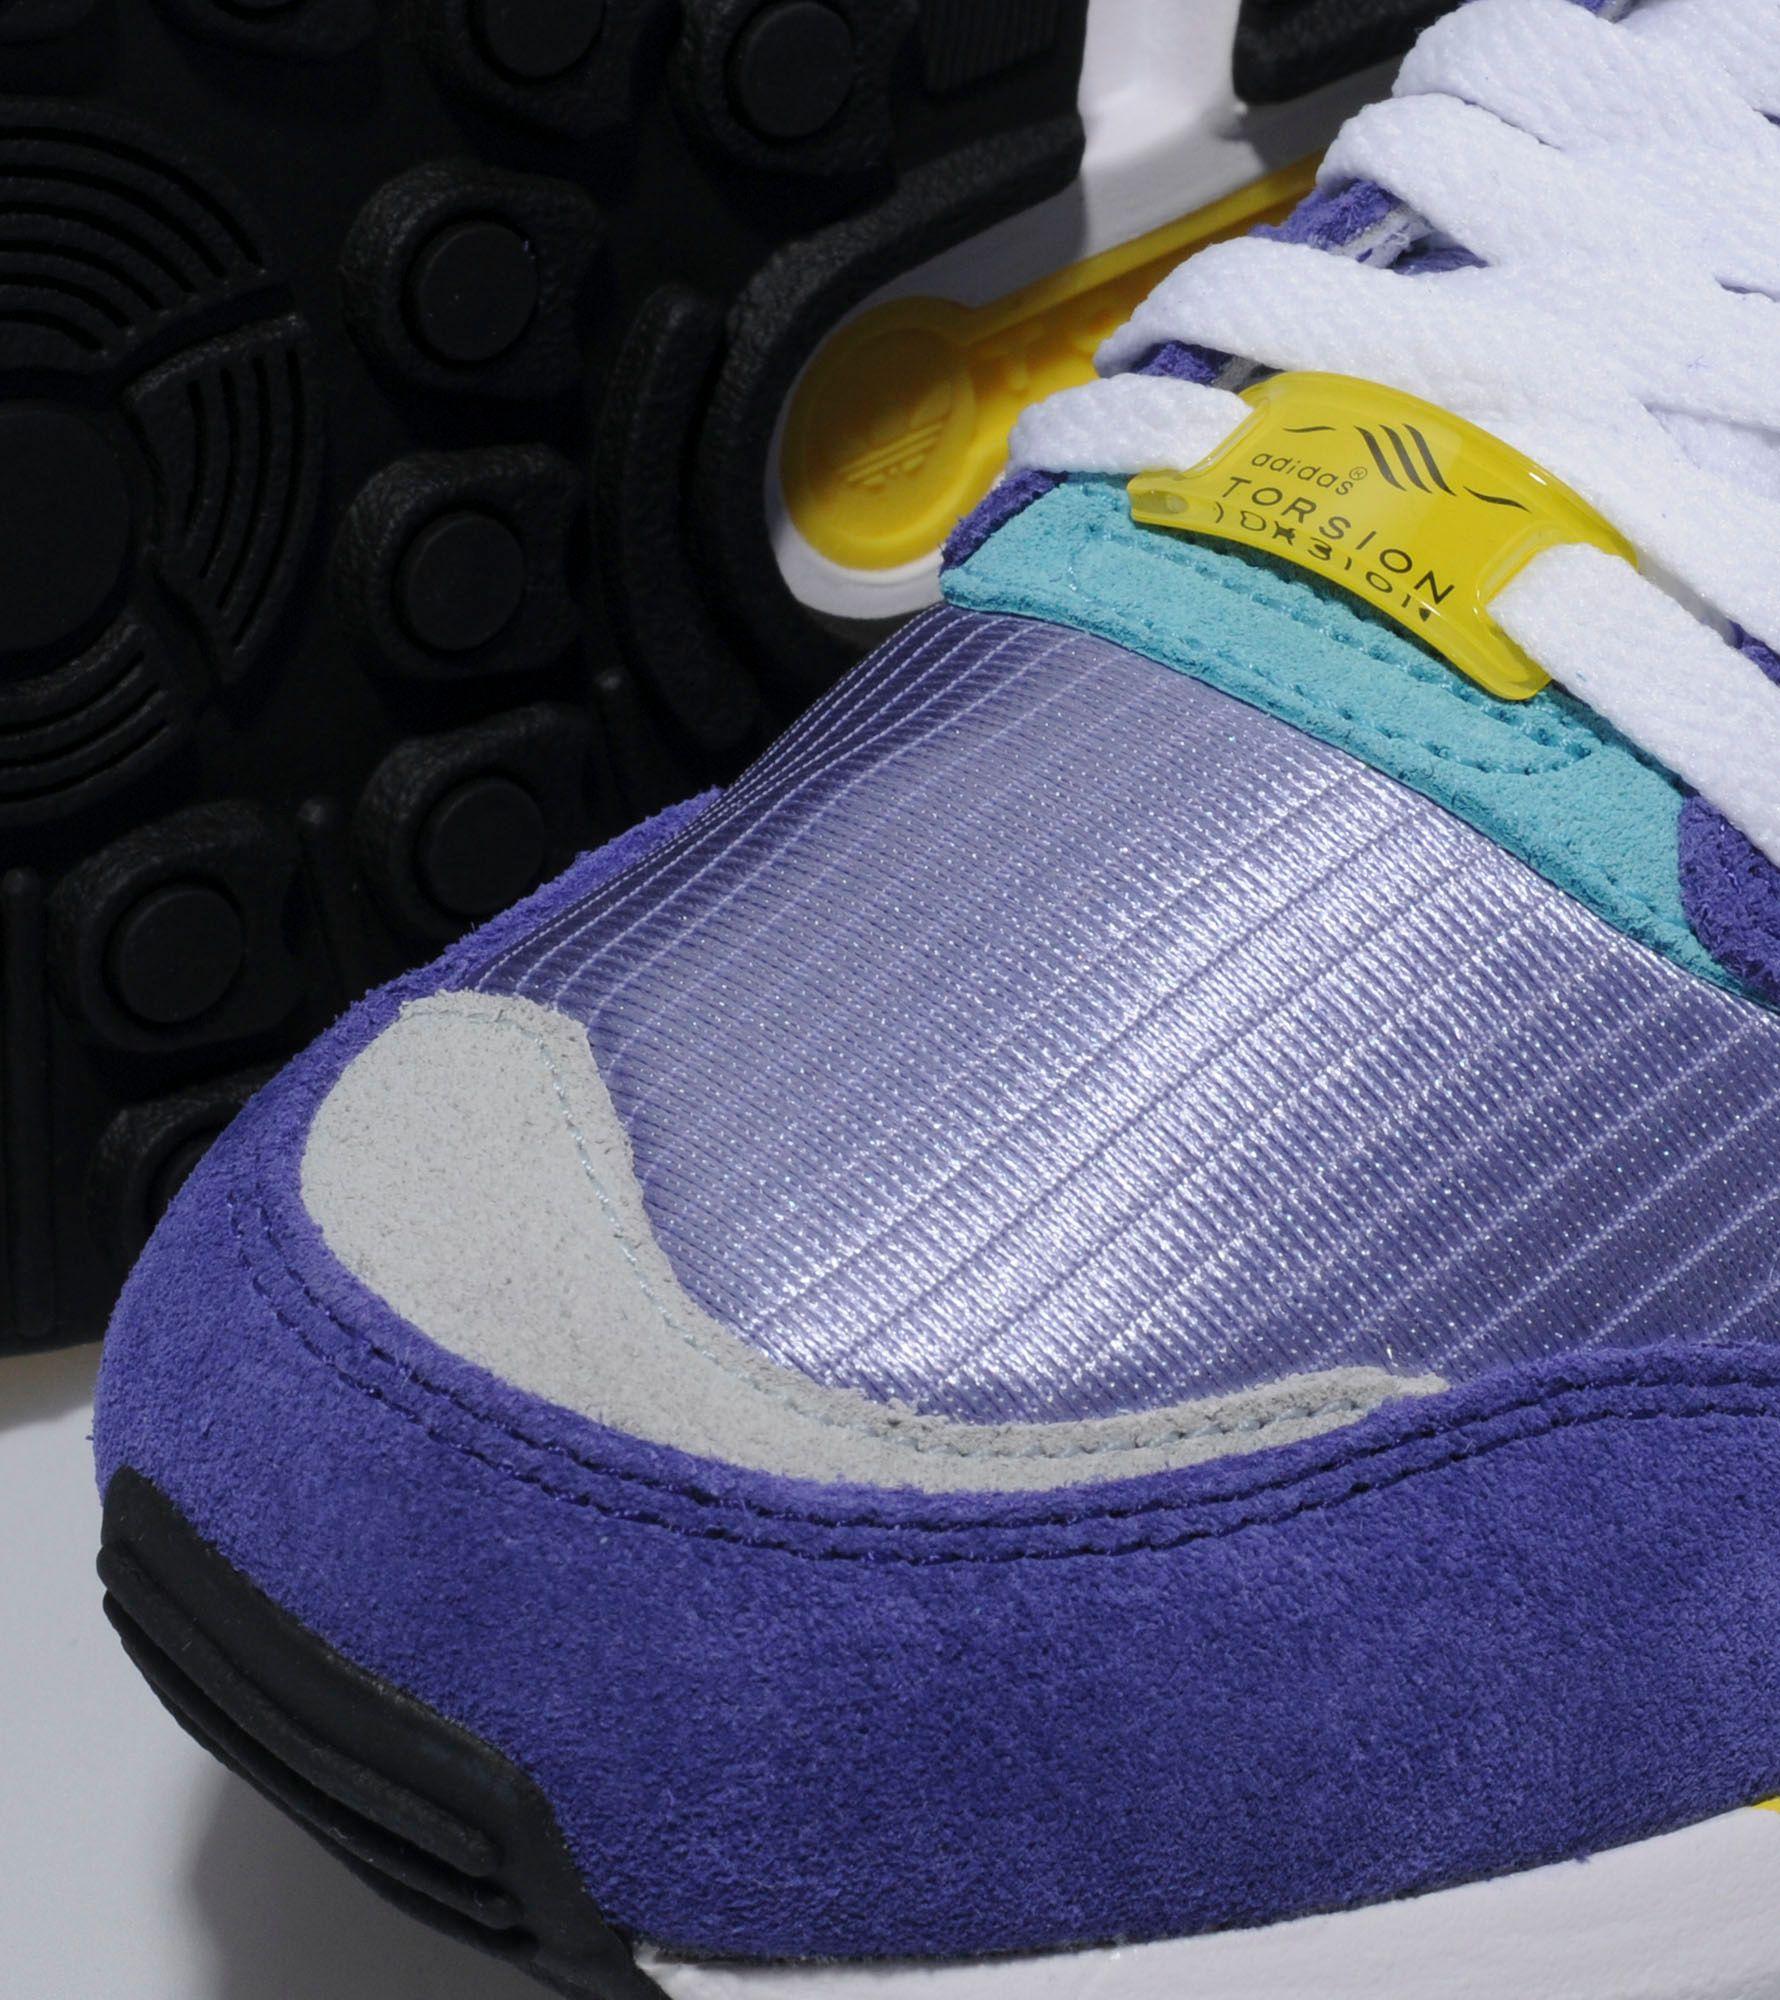 Adidas Originals Zx 5000 Size Exclusive Size